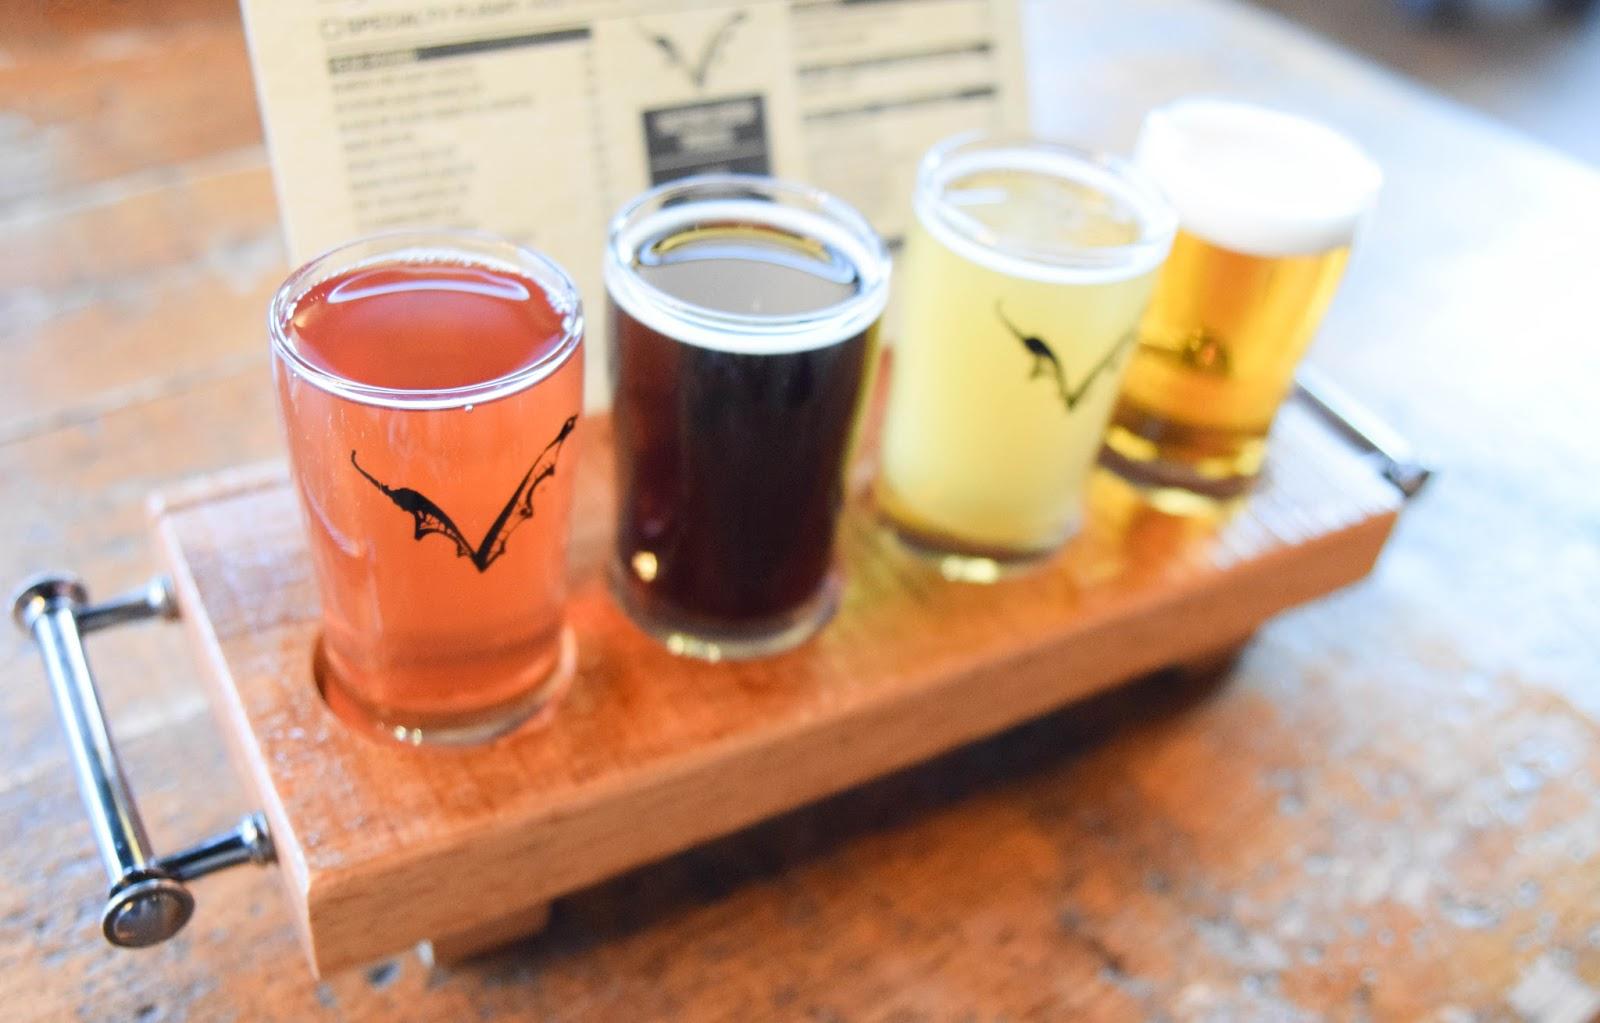 frederick maryland travel guide - visit frederick - frederick maryland brewery - flying dog brewery